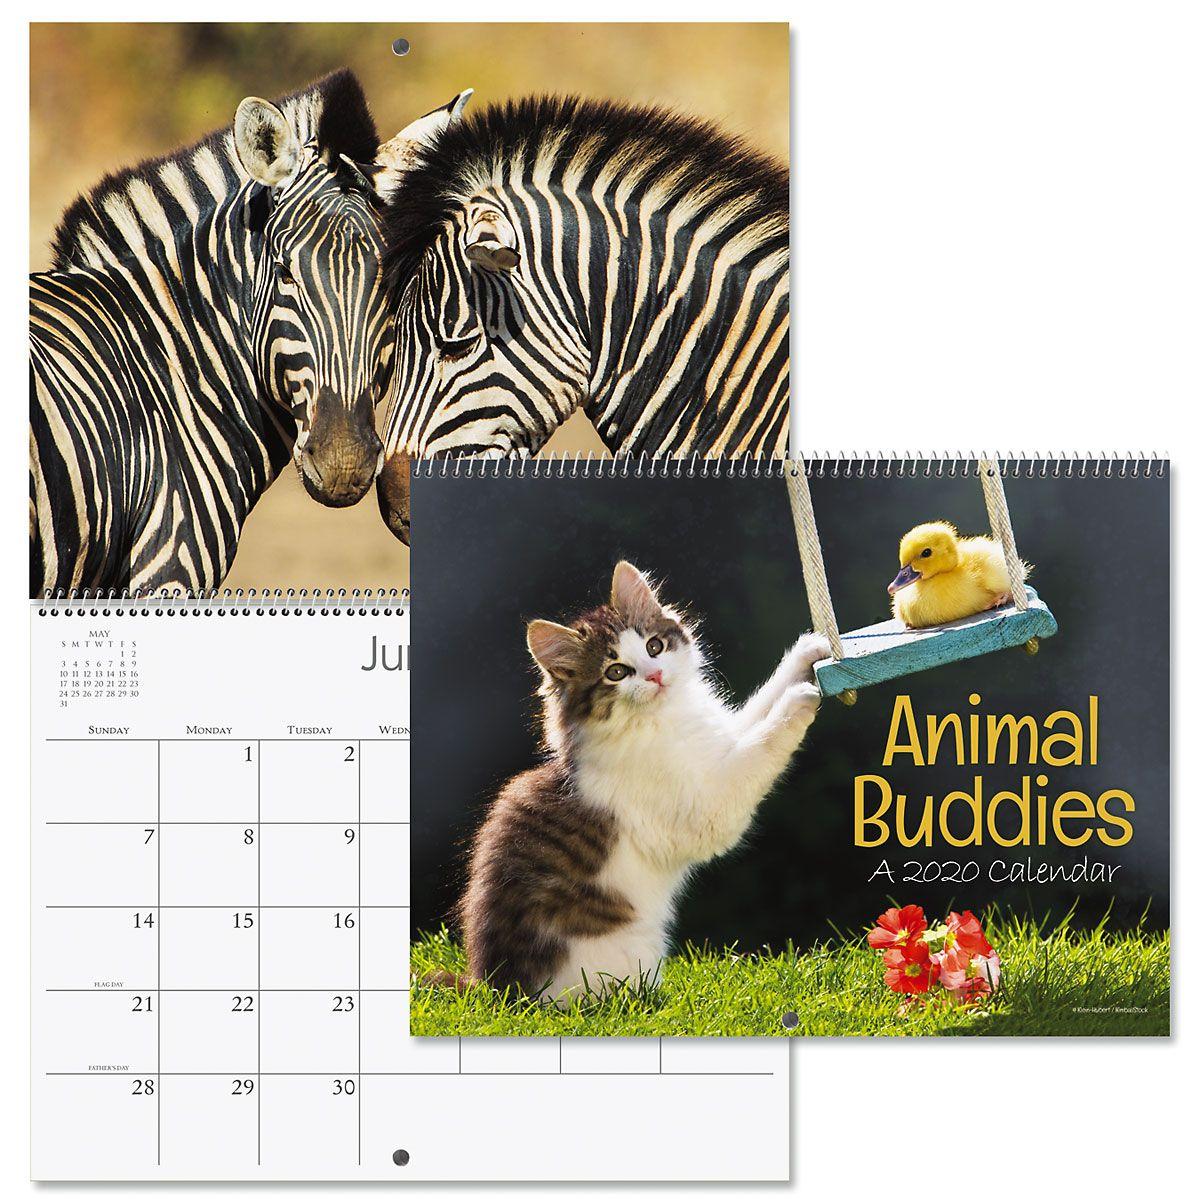 2020 Animal Buddies Wall Calendar